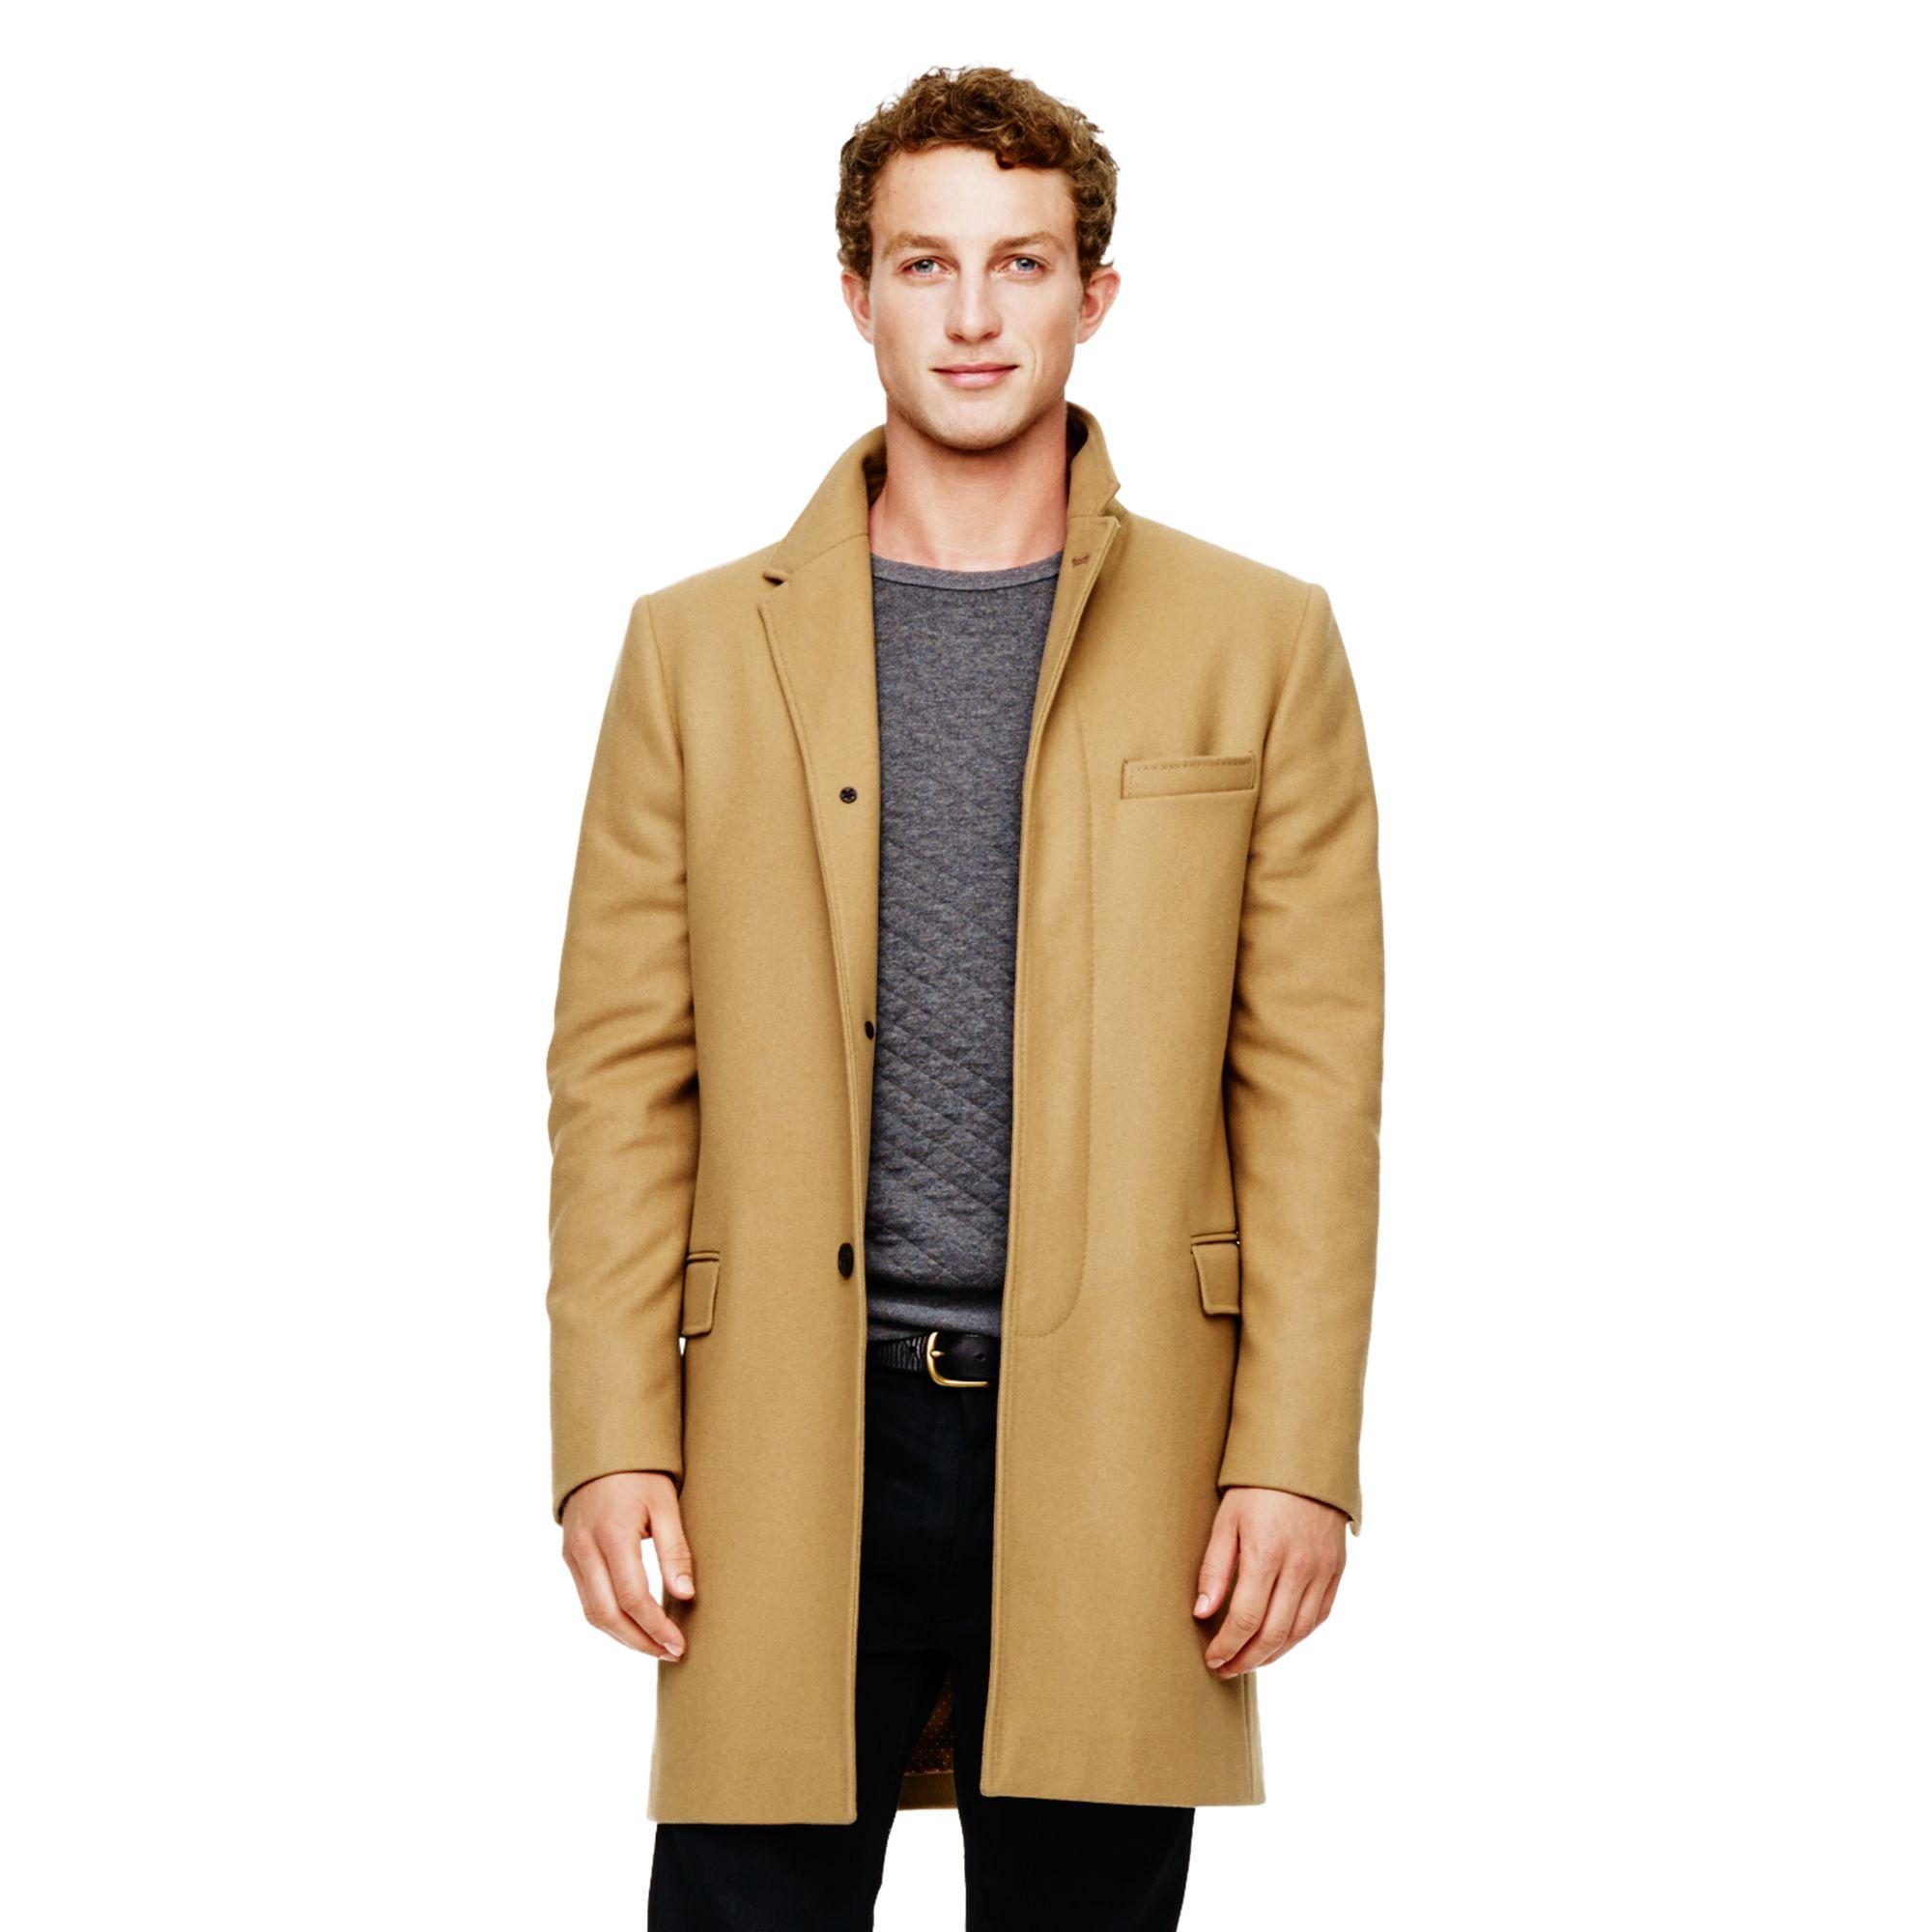 club monaco wool top coat in natural for men lyst. Black Bedroom Furniture Sets. Home Design Ideas